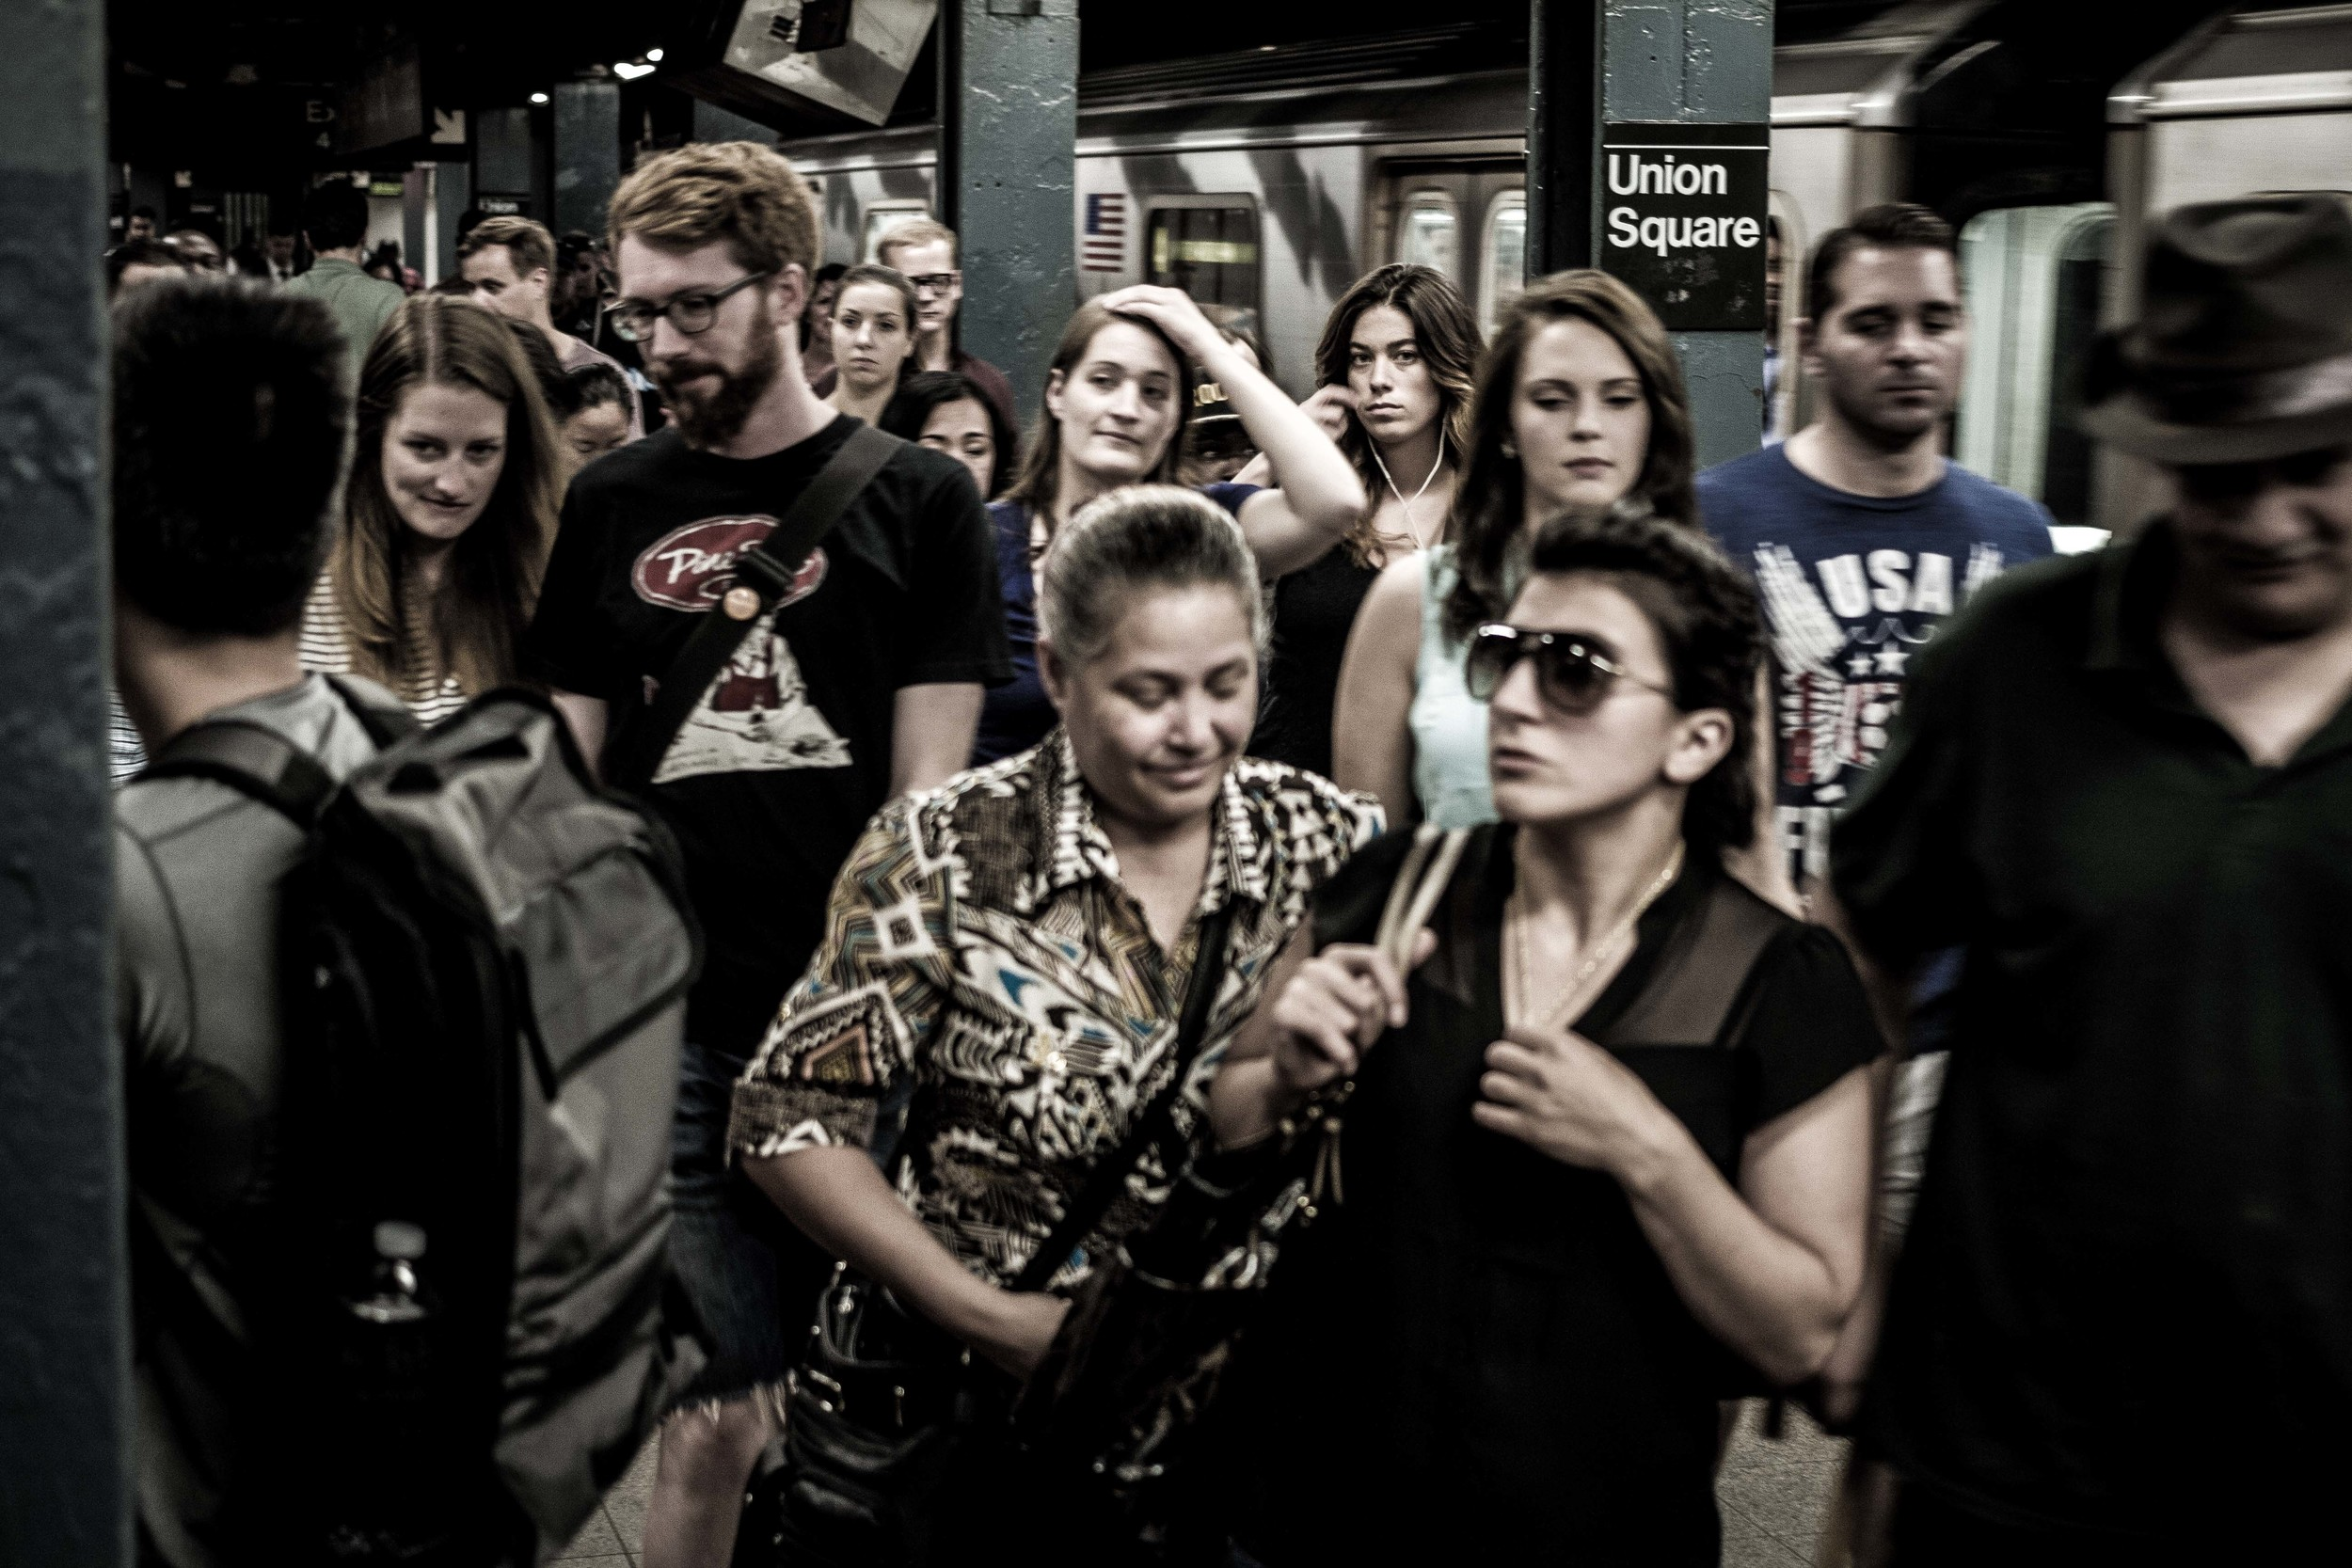 NYC-UnionSqSubwayCrowd-80214-lowres.jpg